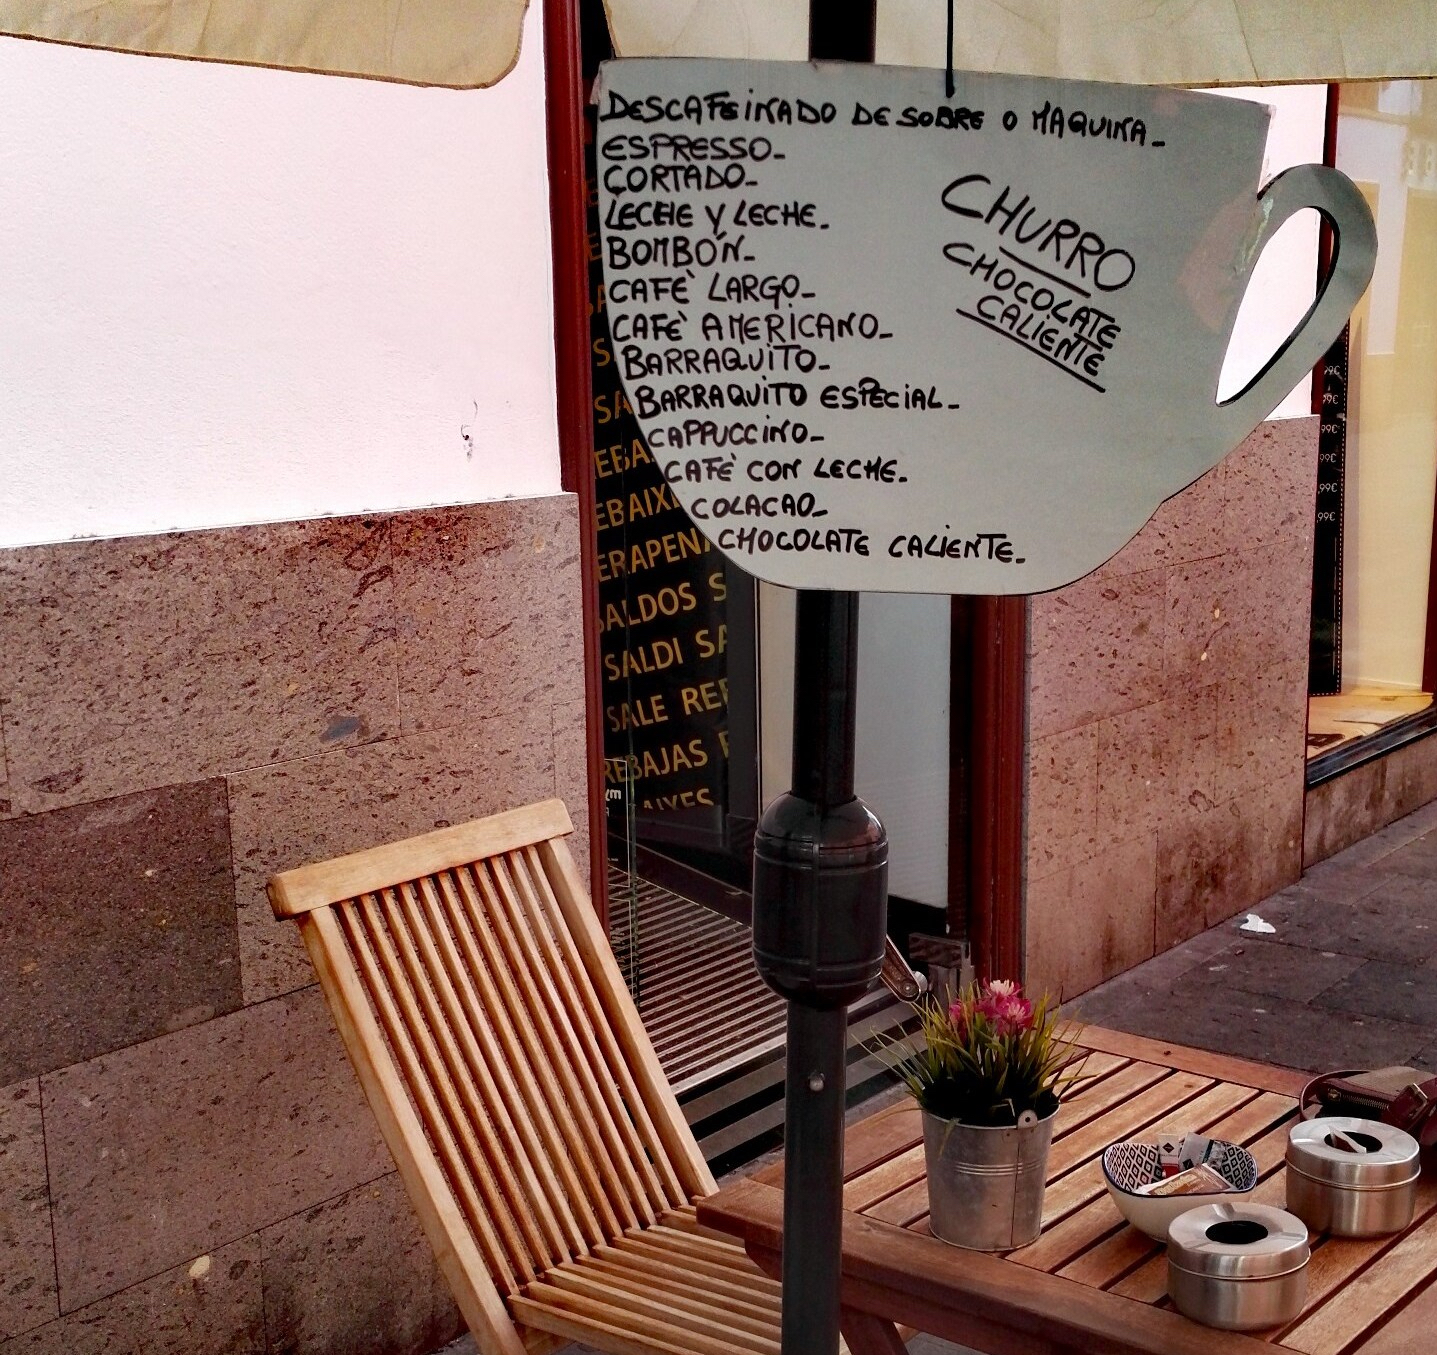 Canarian coffee sign